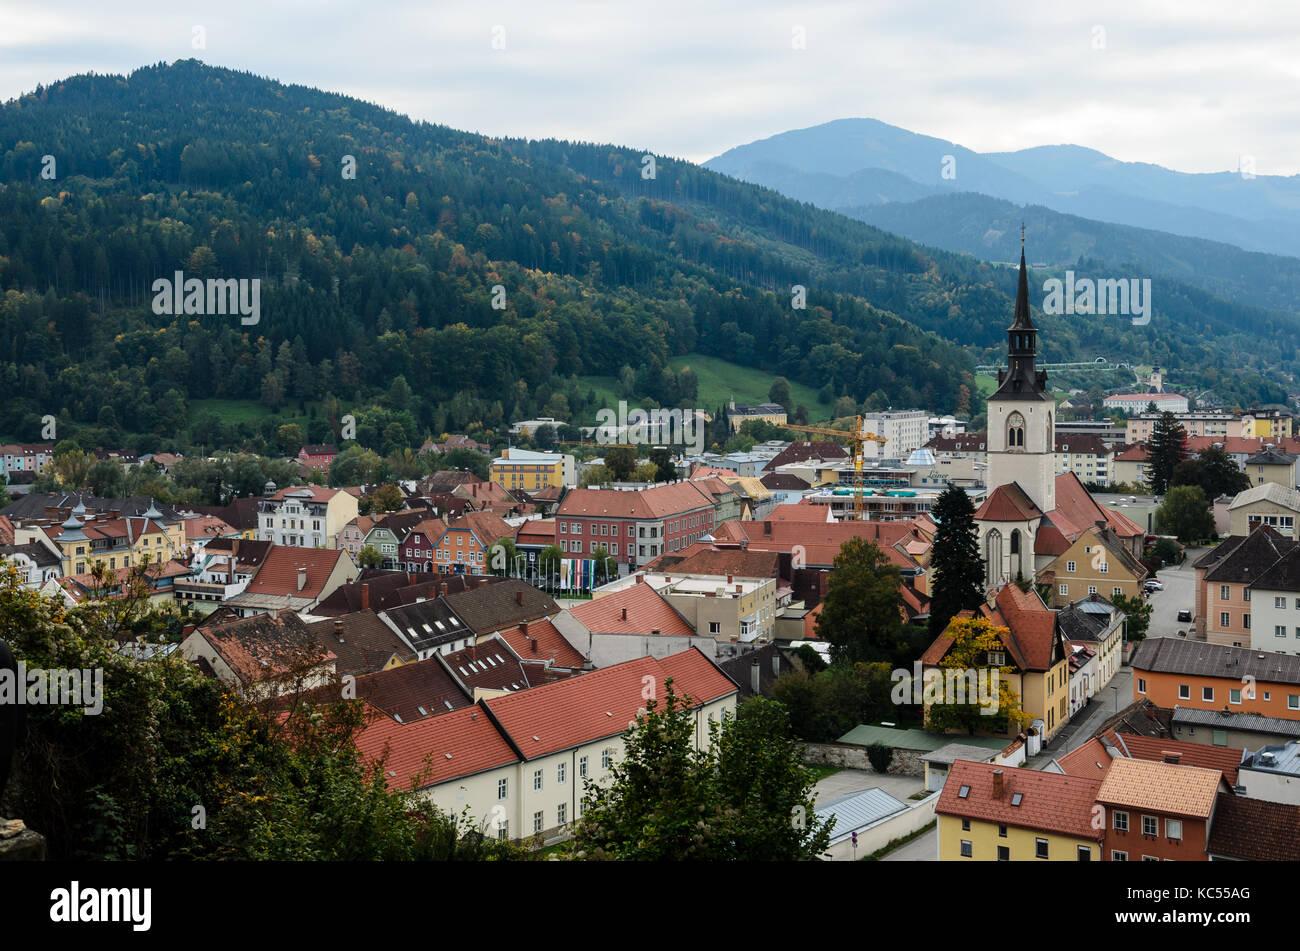 austria bruck styria stock photos  u0026 austria bruck styria